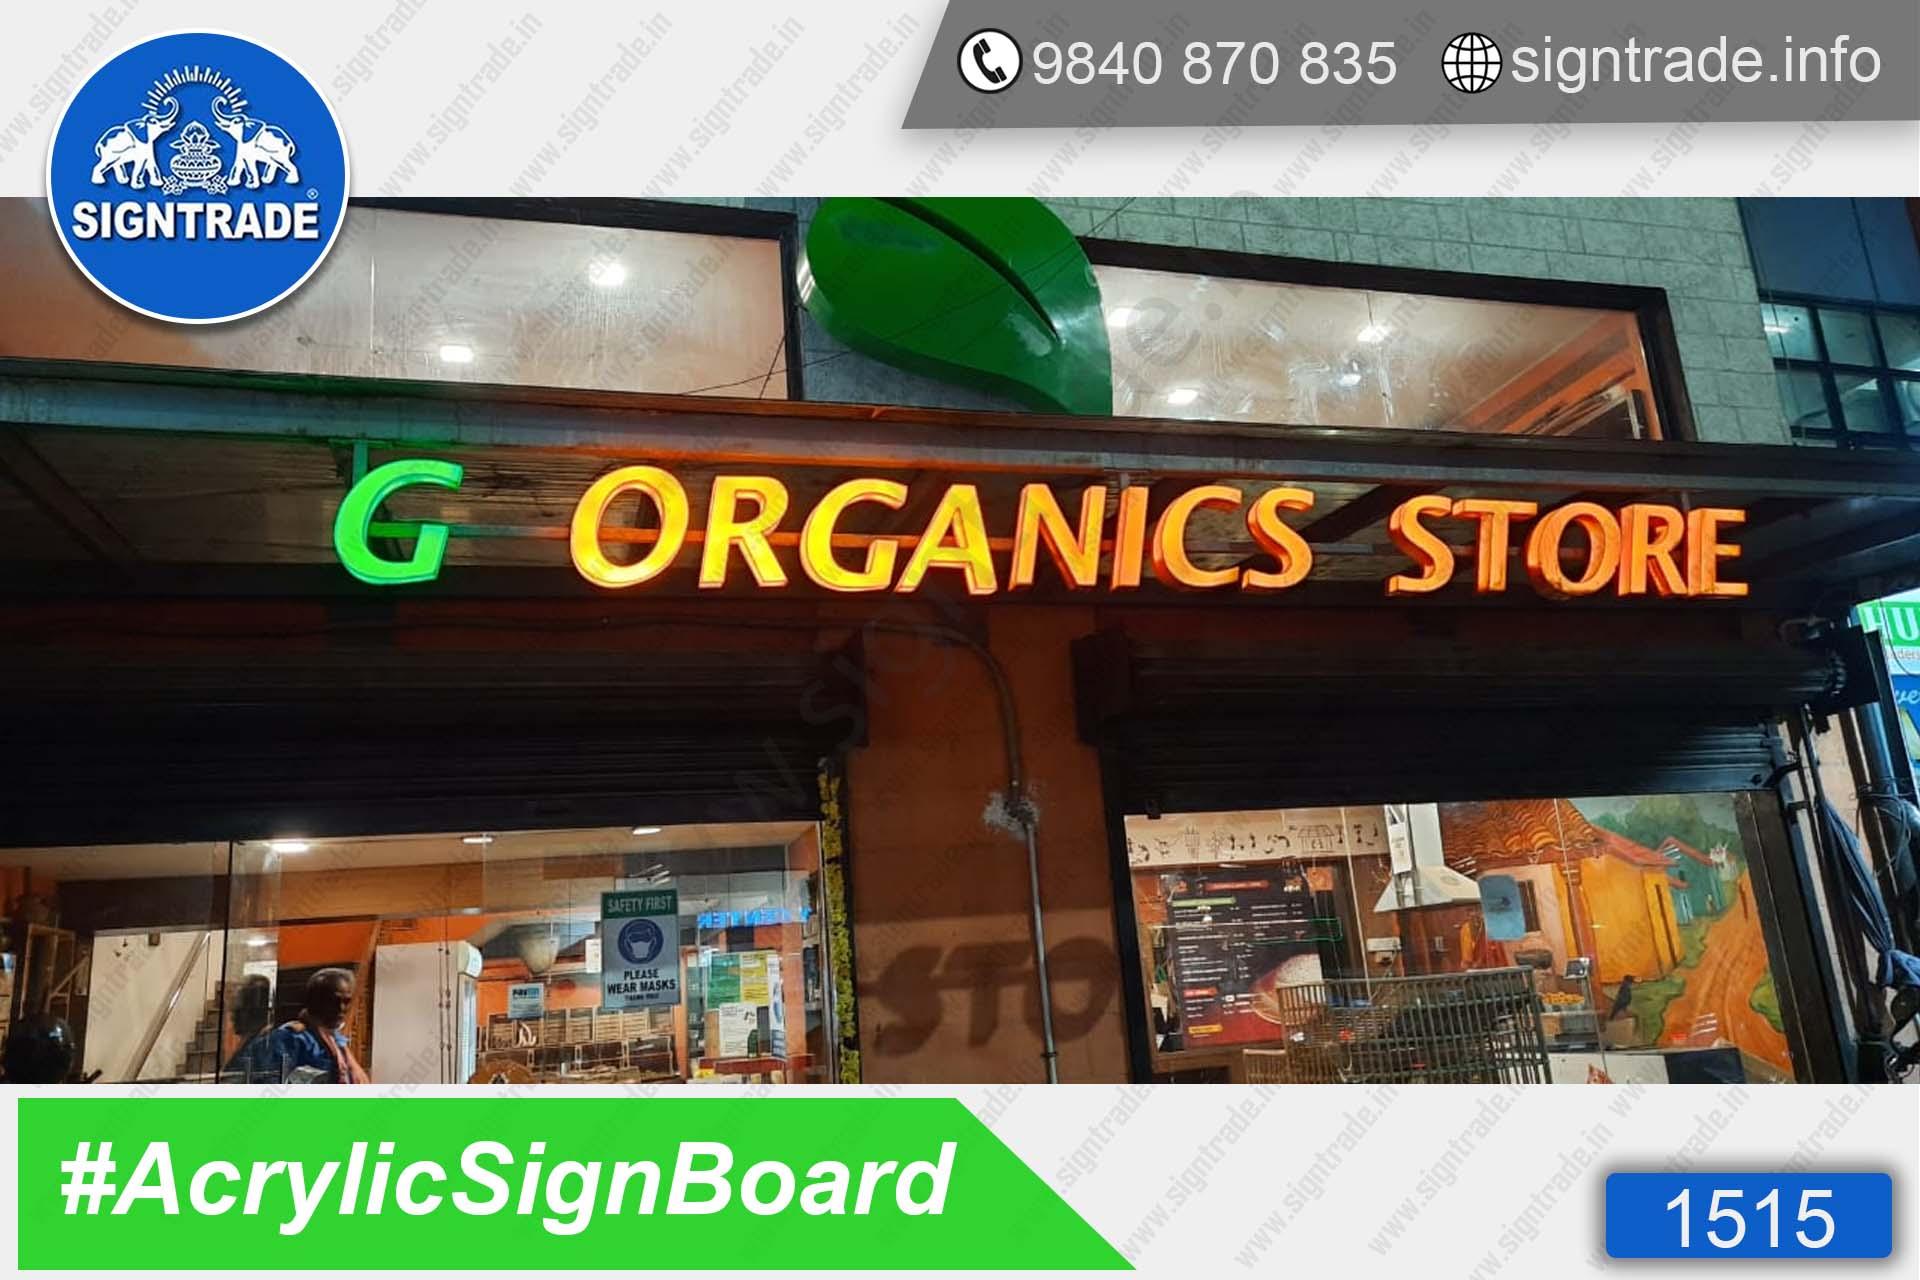 G Organics Store, Valasaravakkam, Chennai - SIGNTRADE - Acrylic, LED Sign Board Manufacturers in Chennai